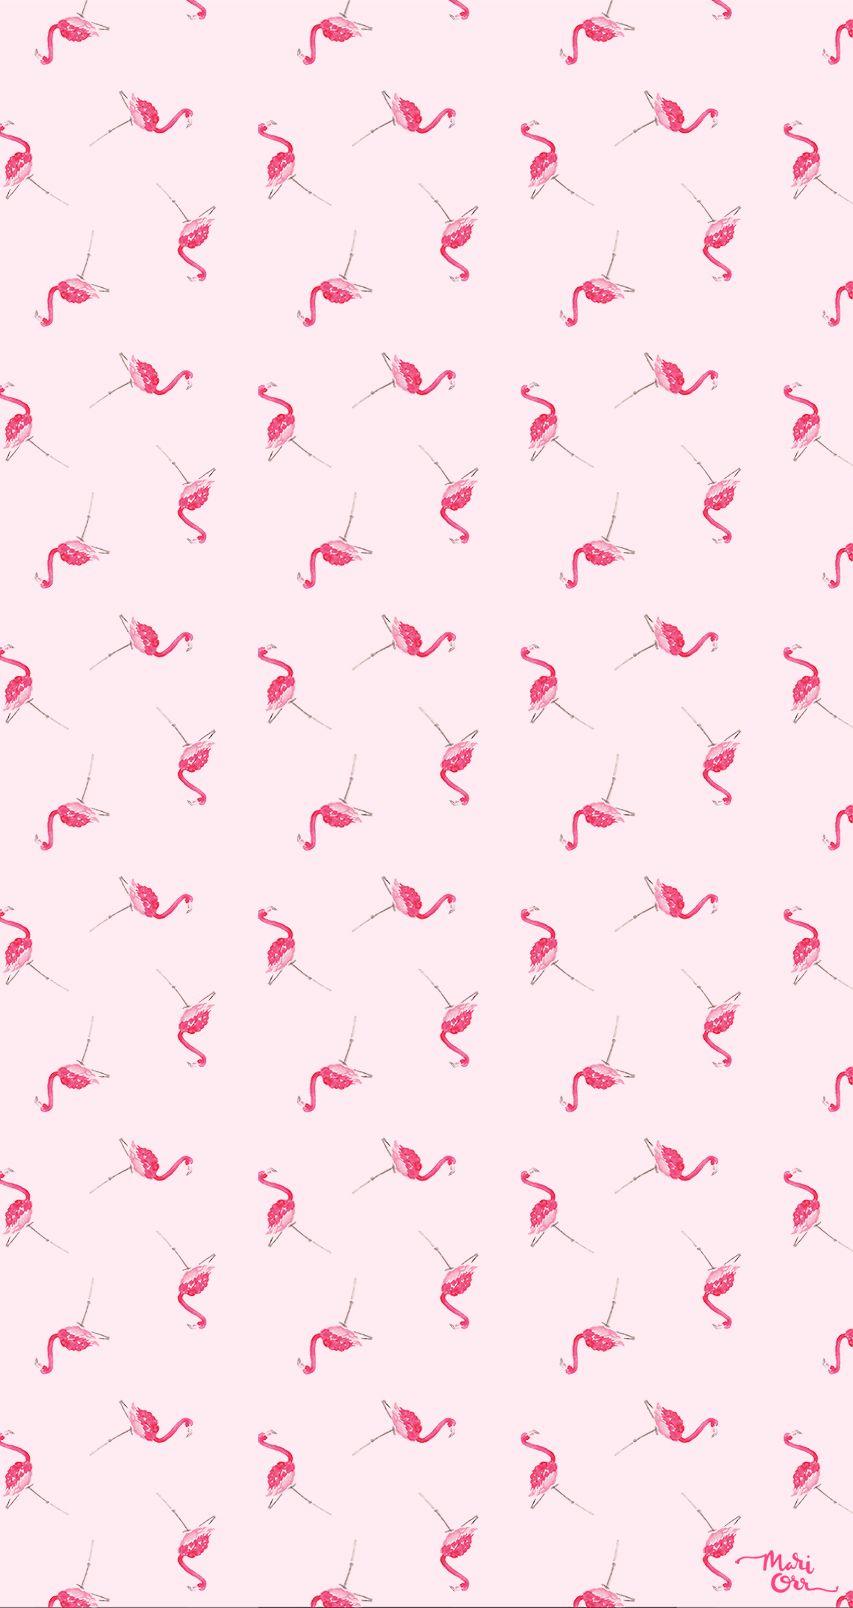 Background flamingo flamingos iphone wallpaper wallpaper - Ohsobeautifulpaper Com Wp Content Uploads 2015 03 Mari Orr Pink Flamingo Iphone Backgroundsiphone